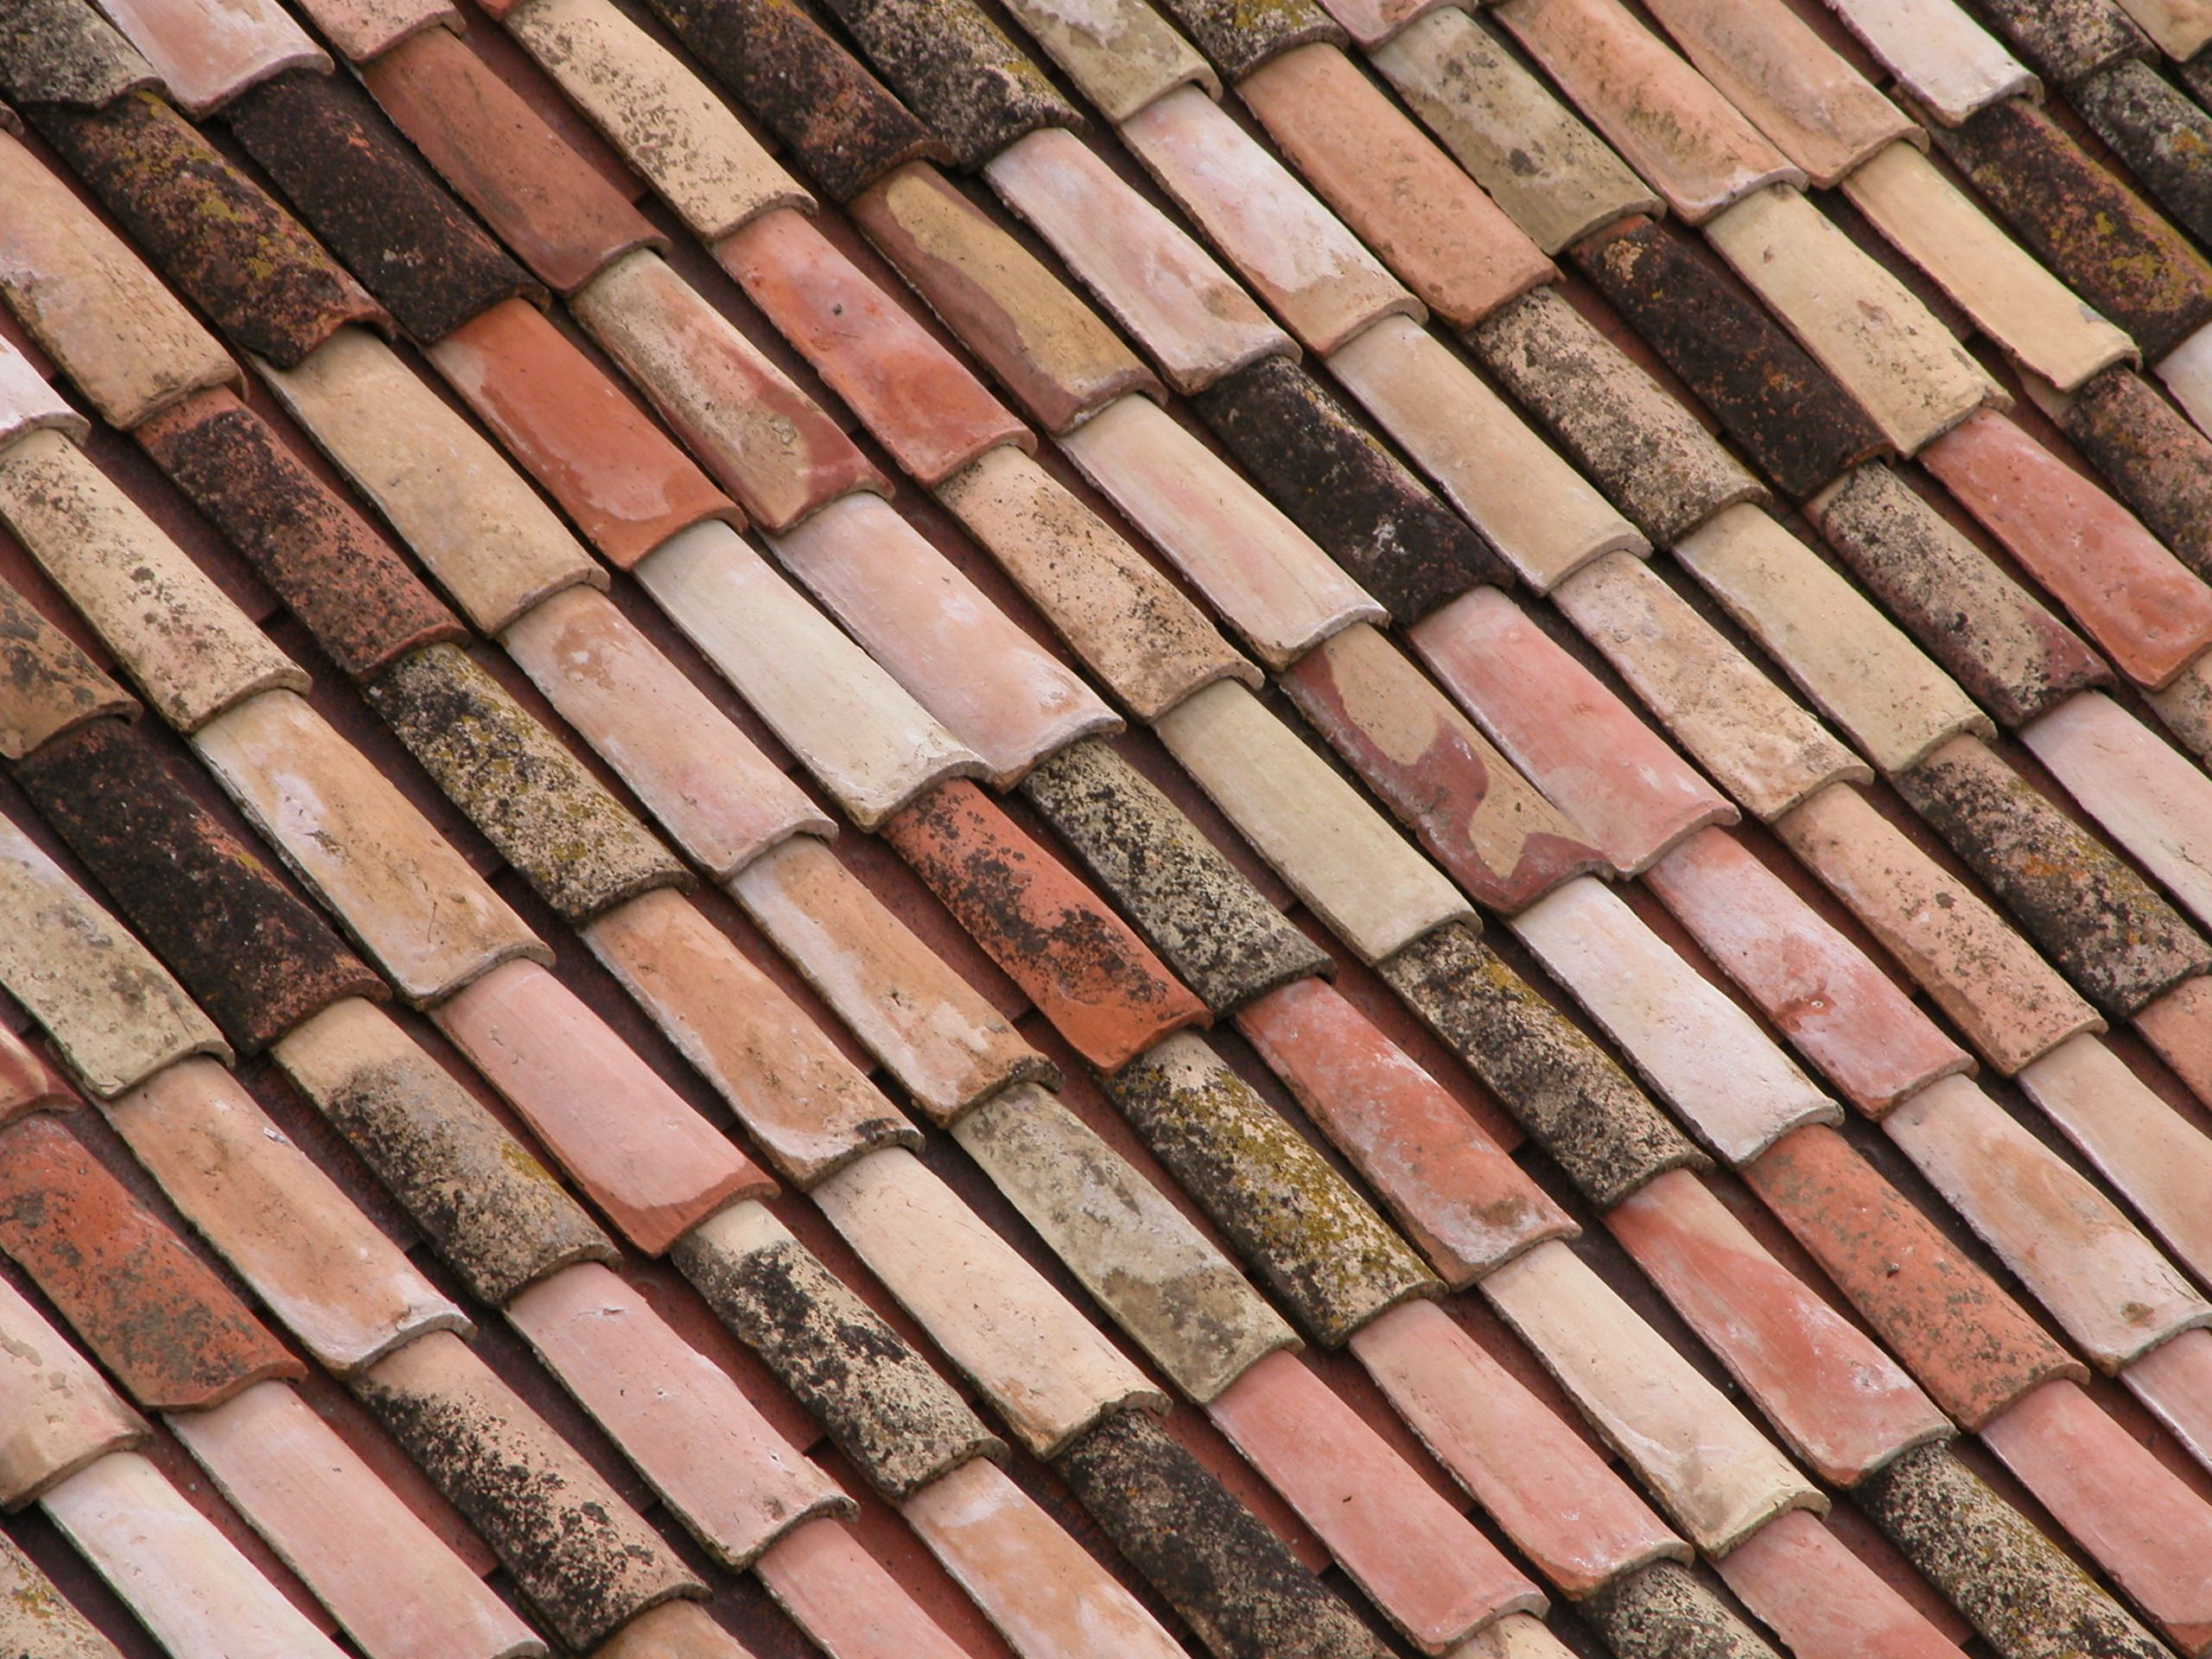 File Terracotta Roof Tiles Jpg Wikimedia Commons Terracotta Roof Terracotta Roof Tiles Roof Tiles